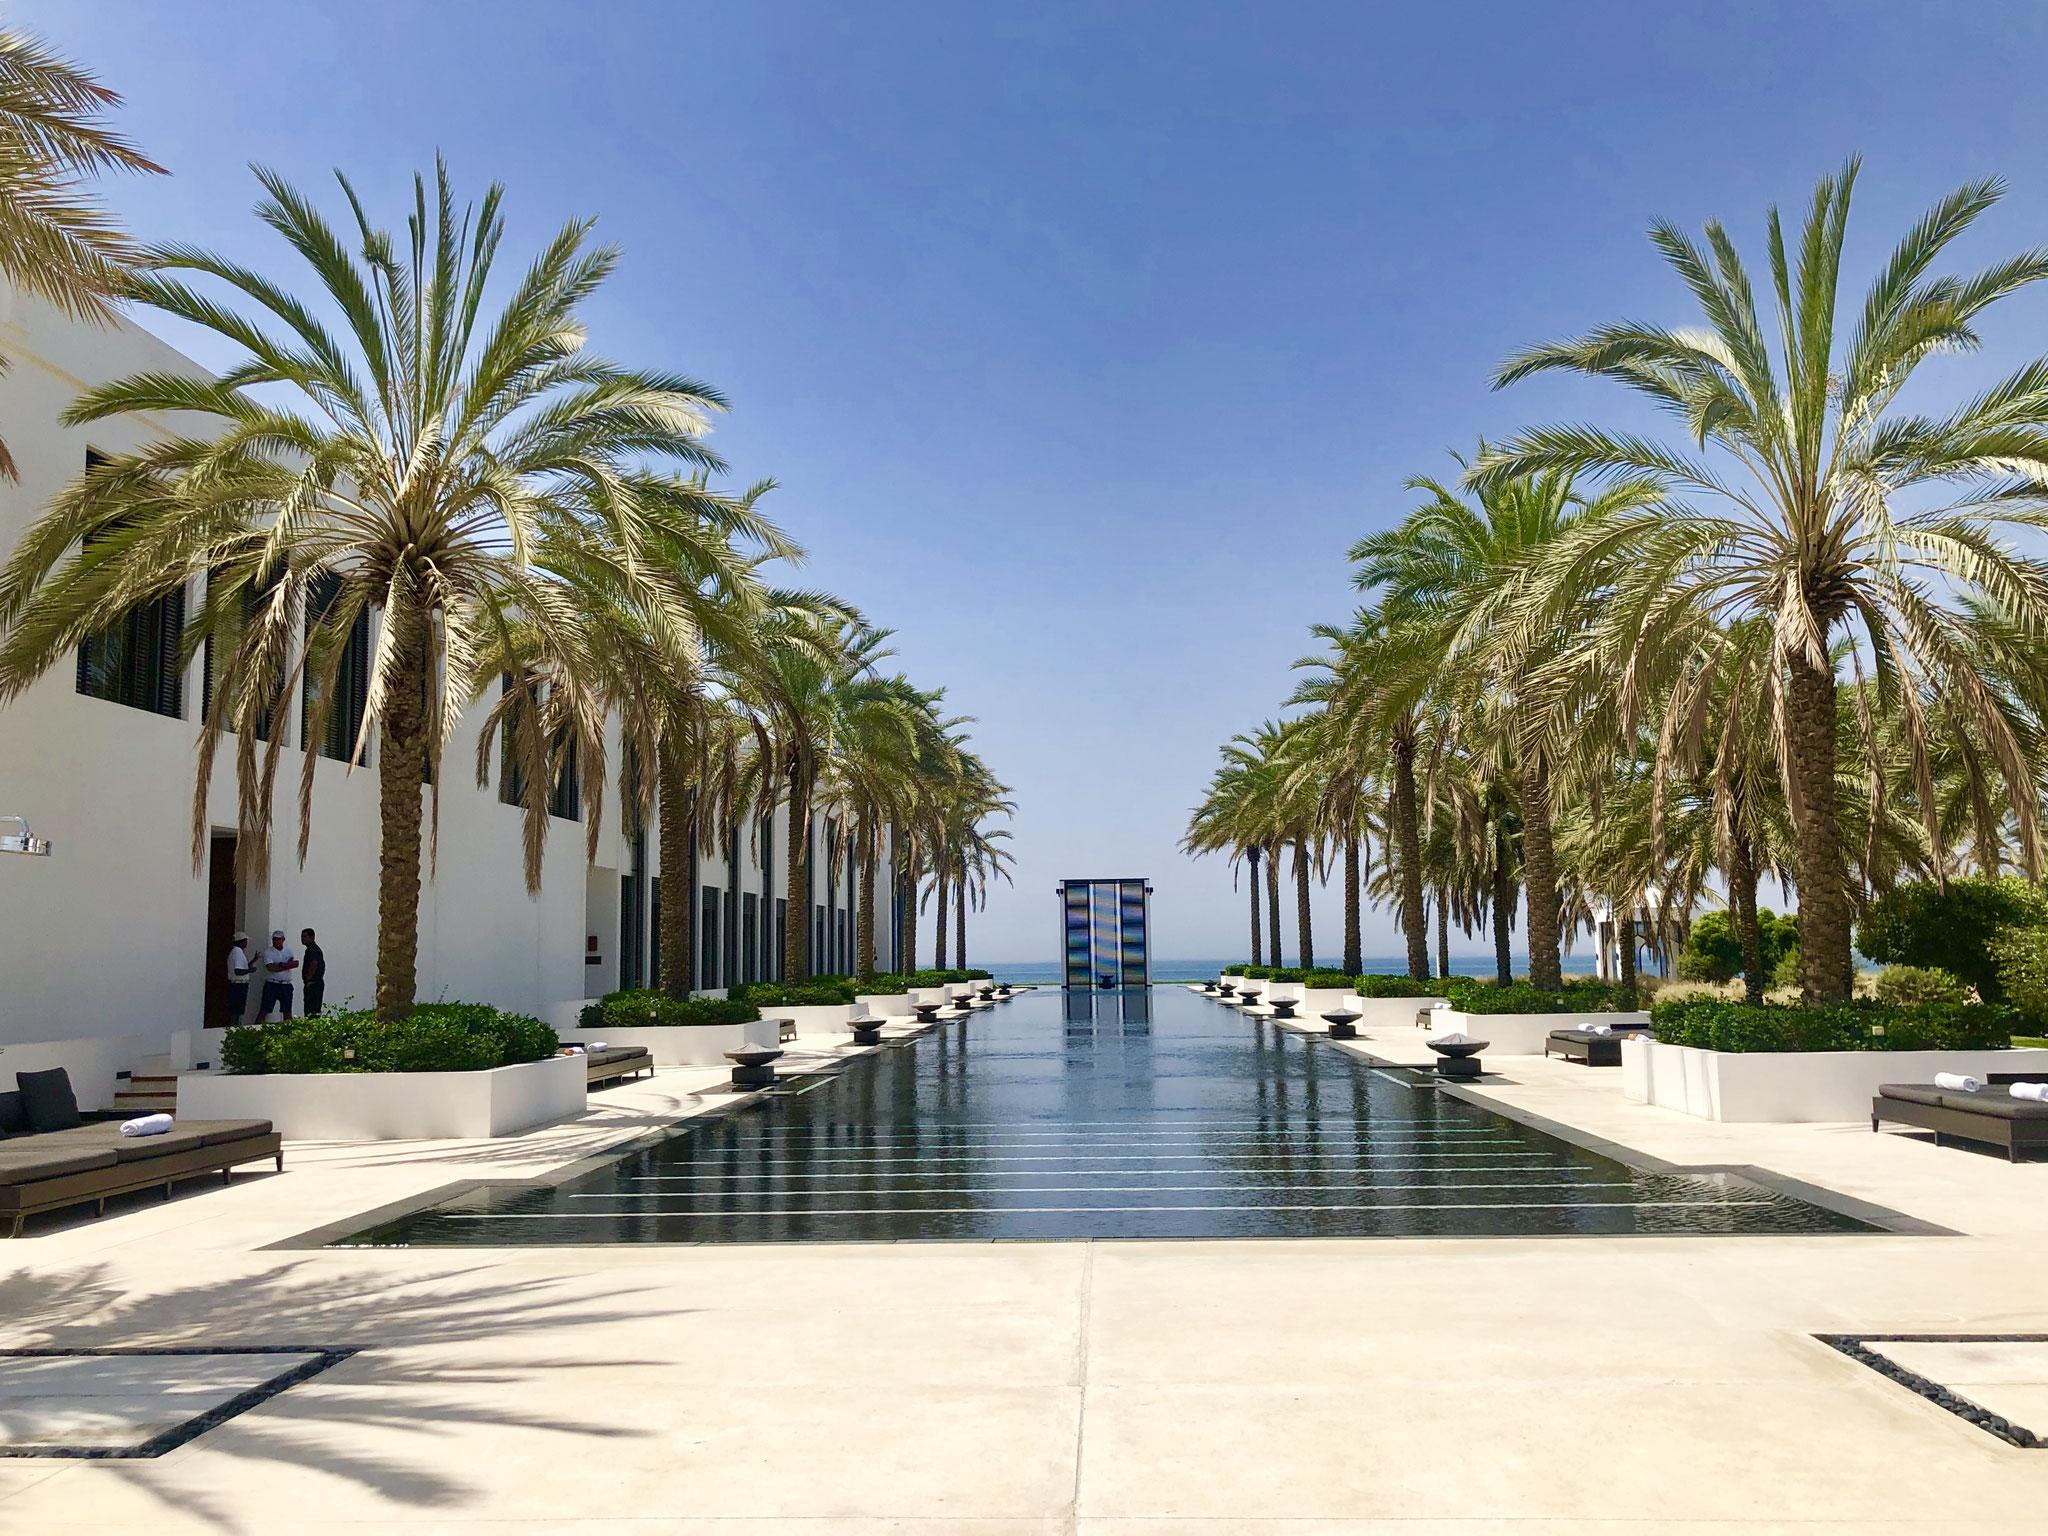 Longest swimming pool in the region